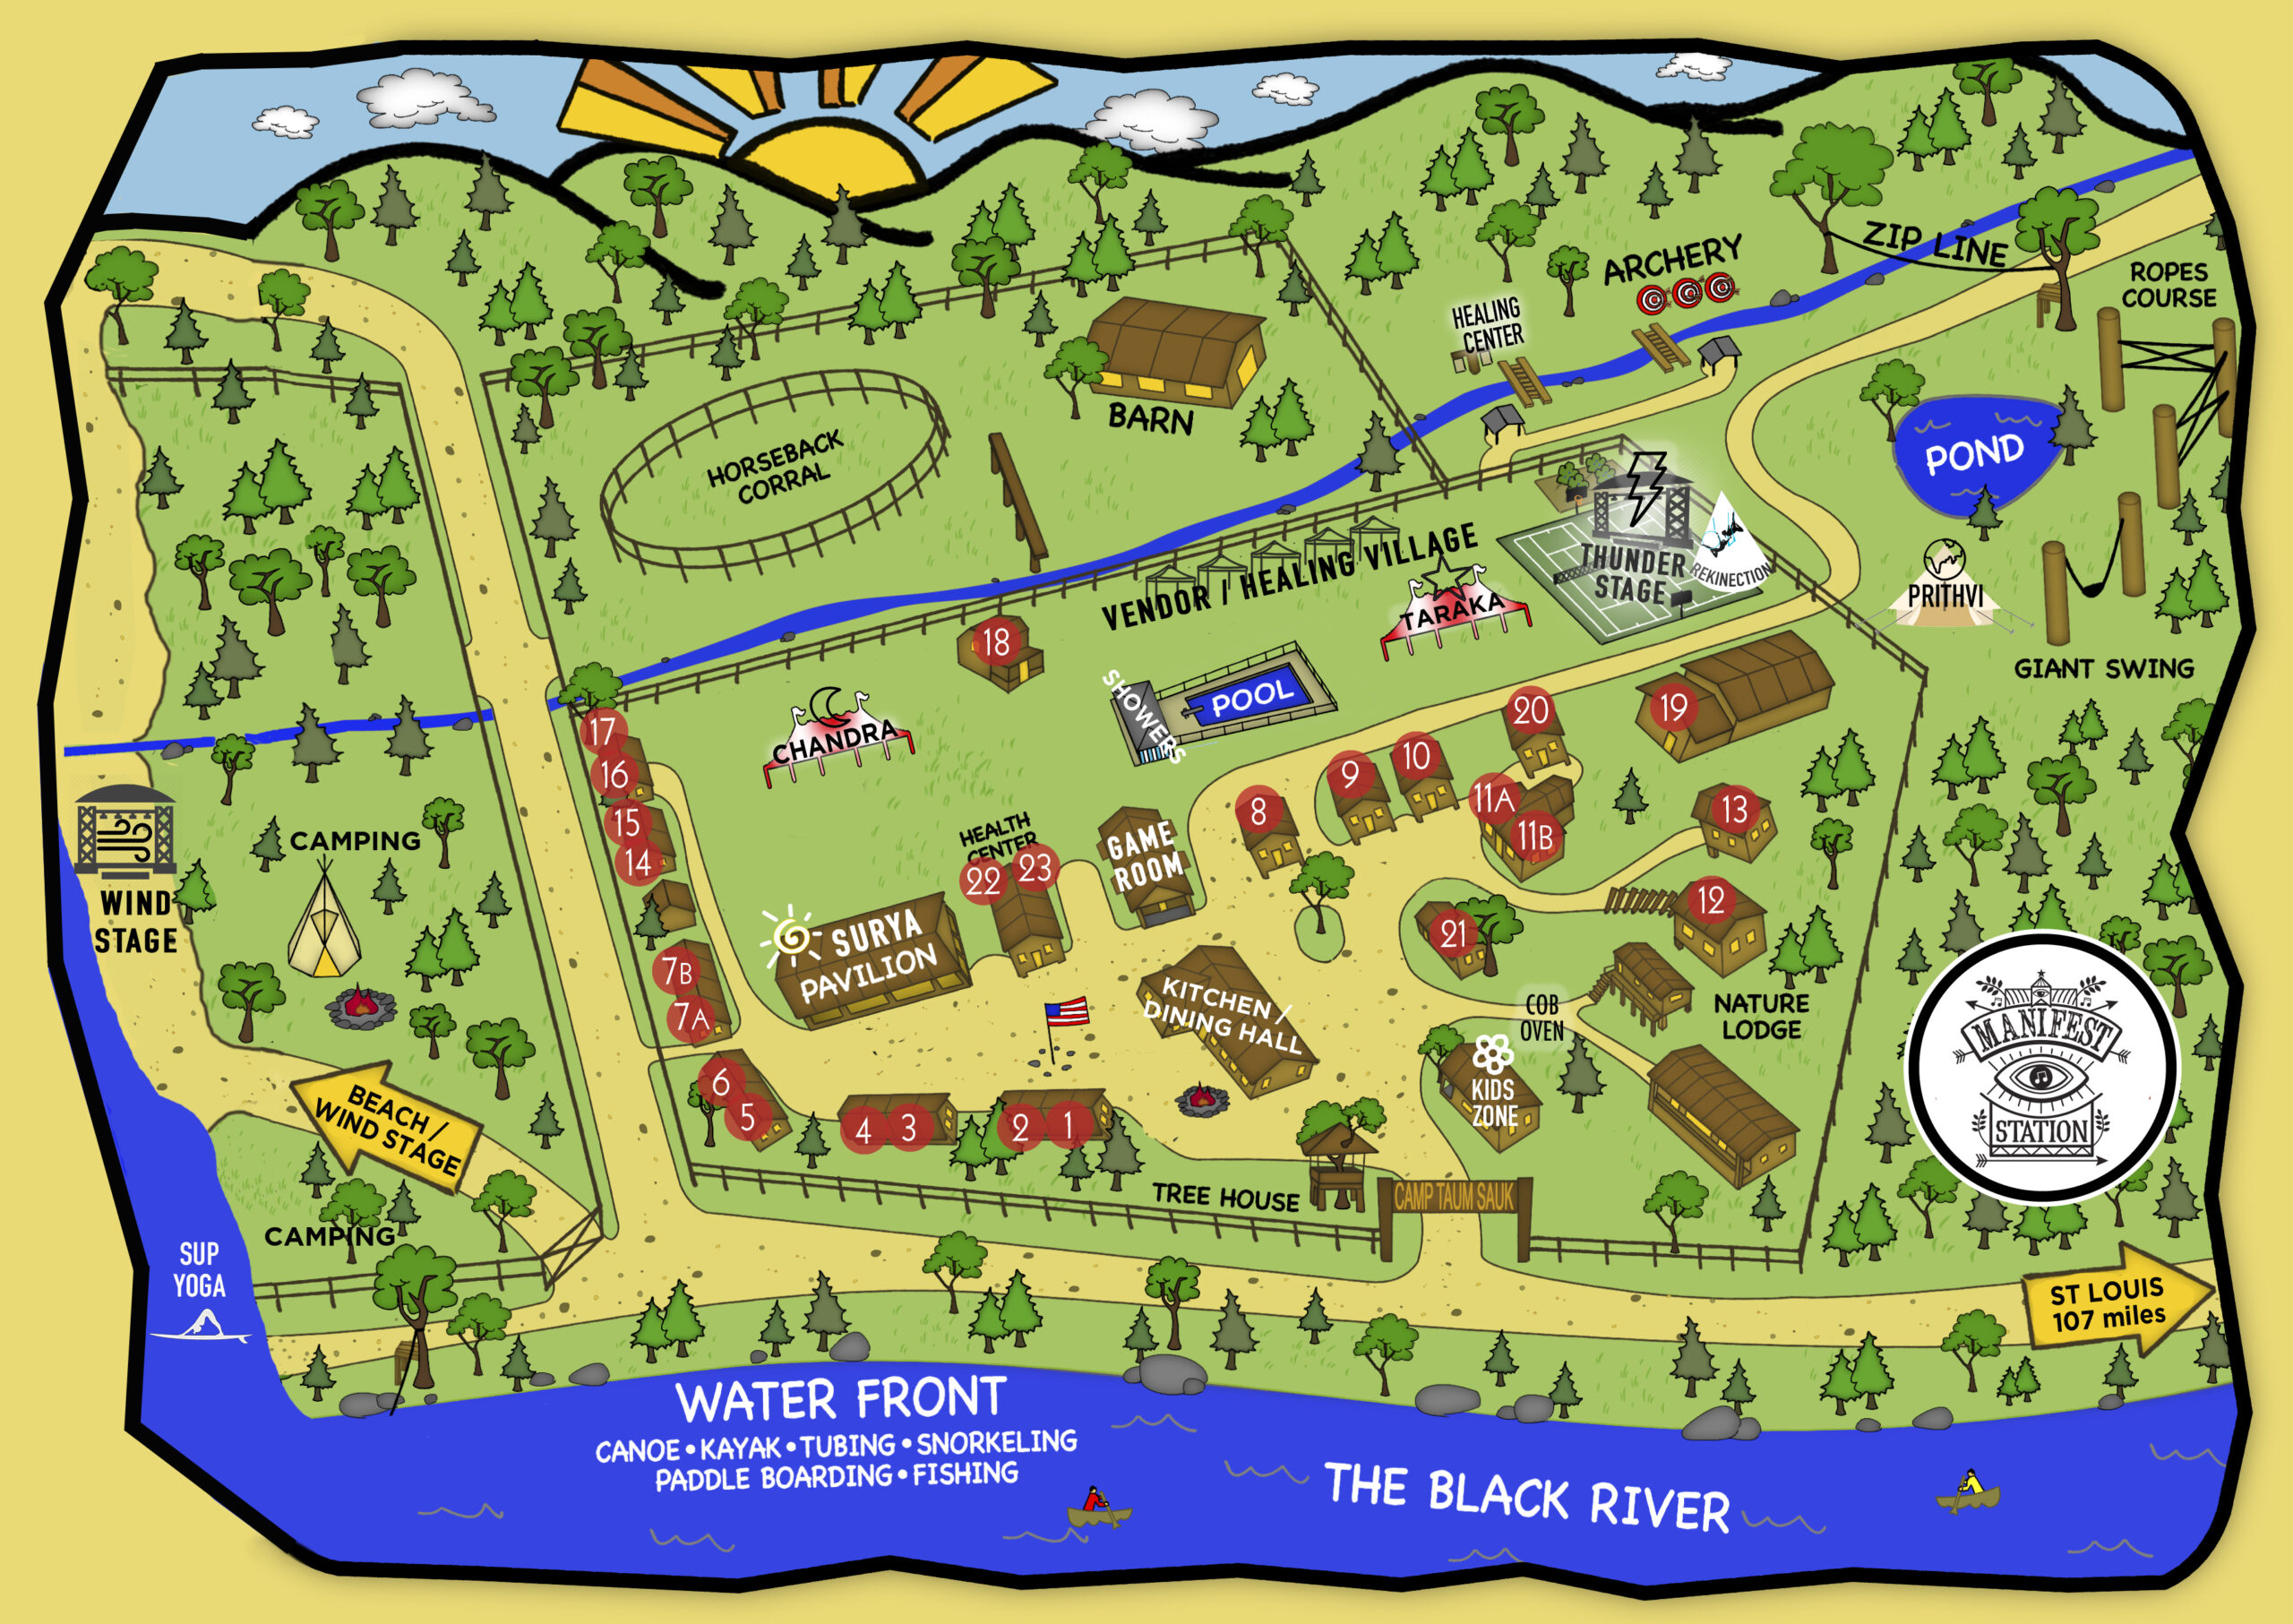 Map of Manifest Station Five at Camp Taum Sauk